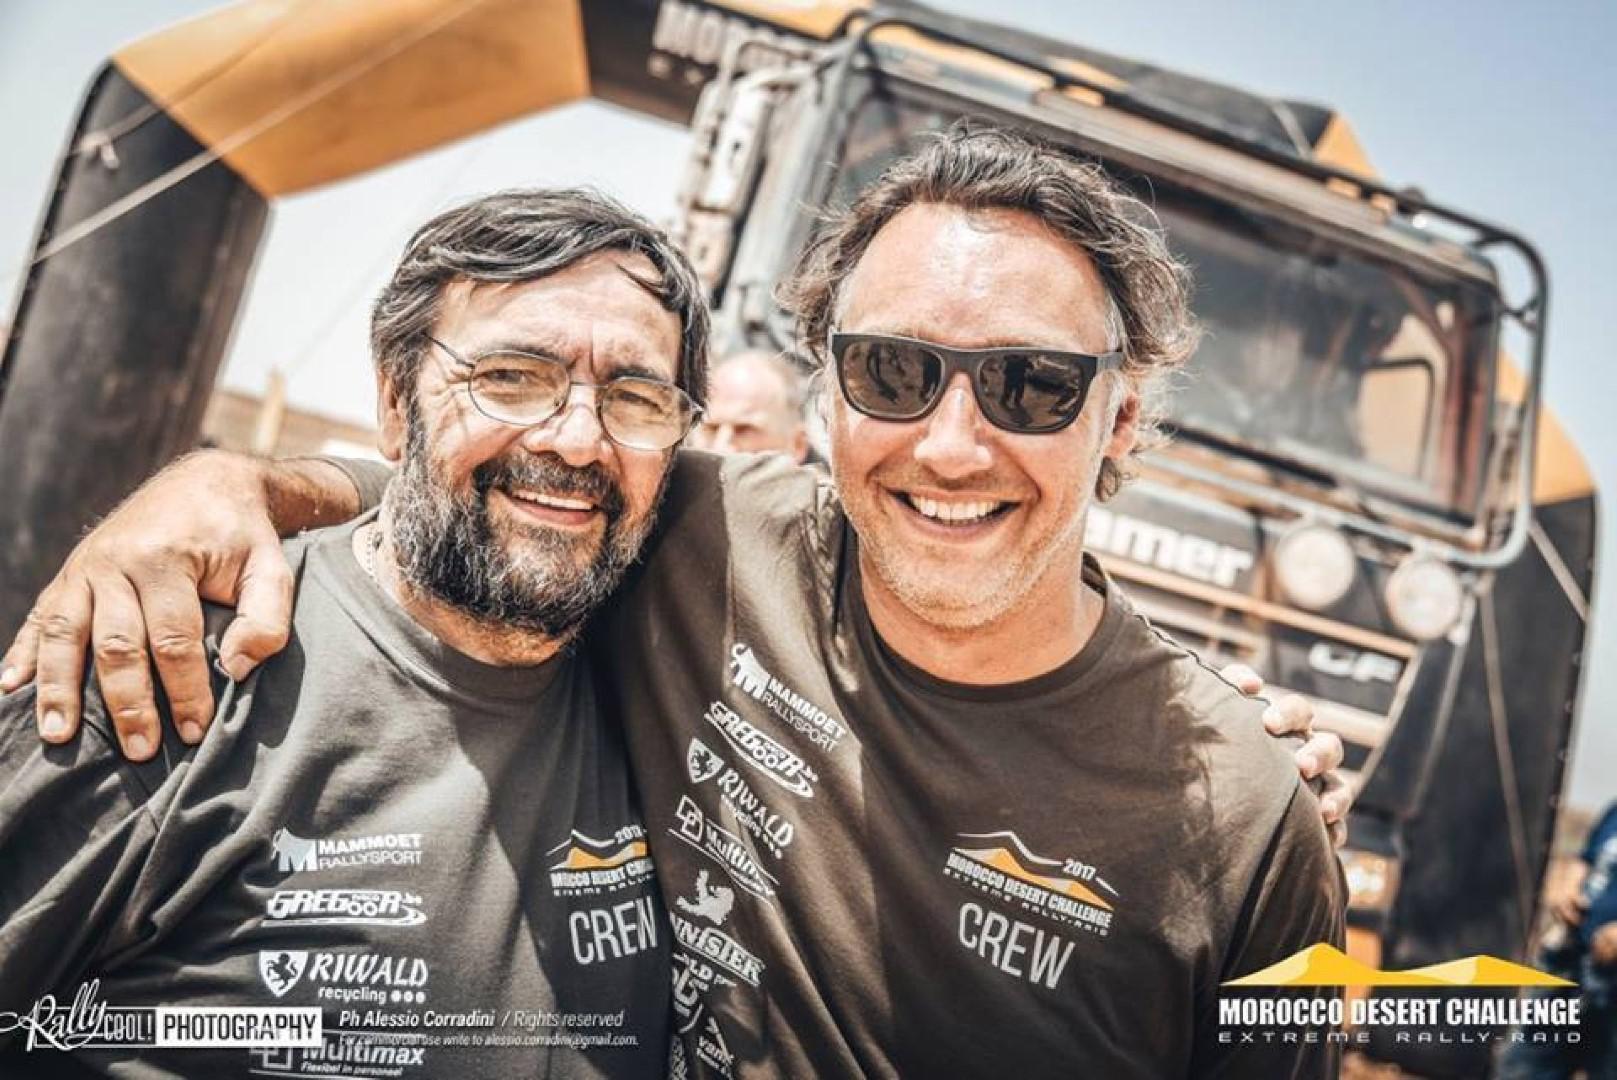 MOROCCO DESERT CHALLENGE 2018: LE SECOND PLUS GRAND RALLYE-RAID AU MONDE